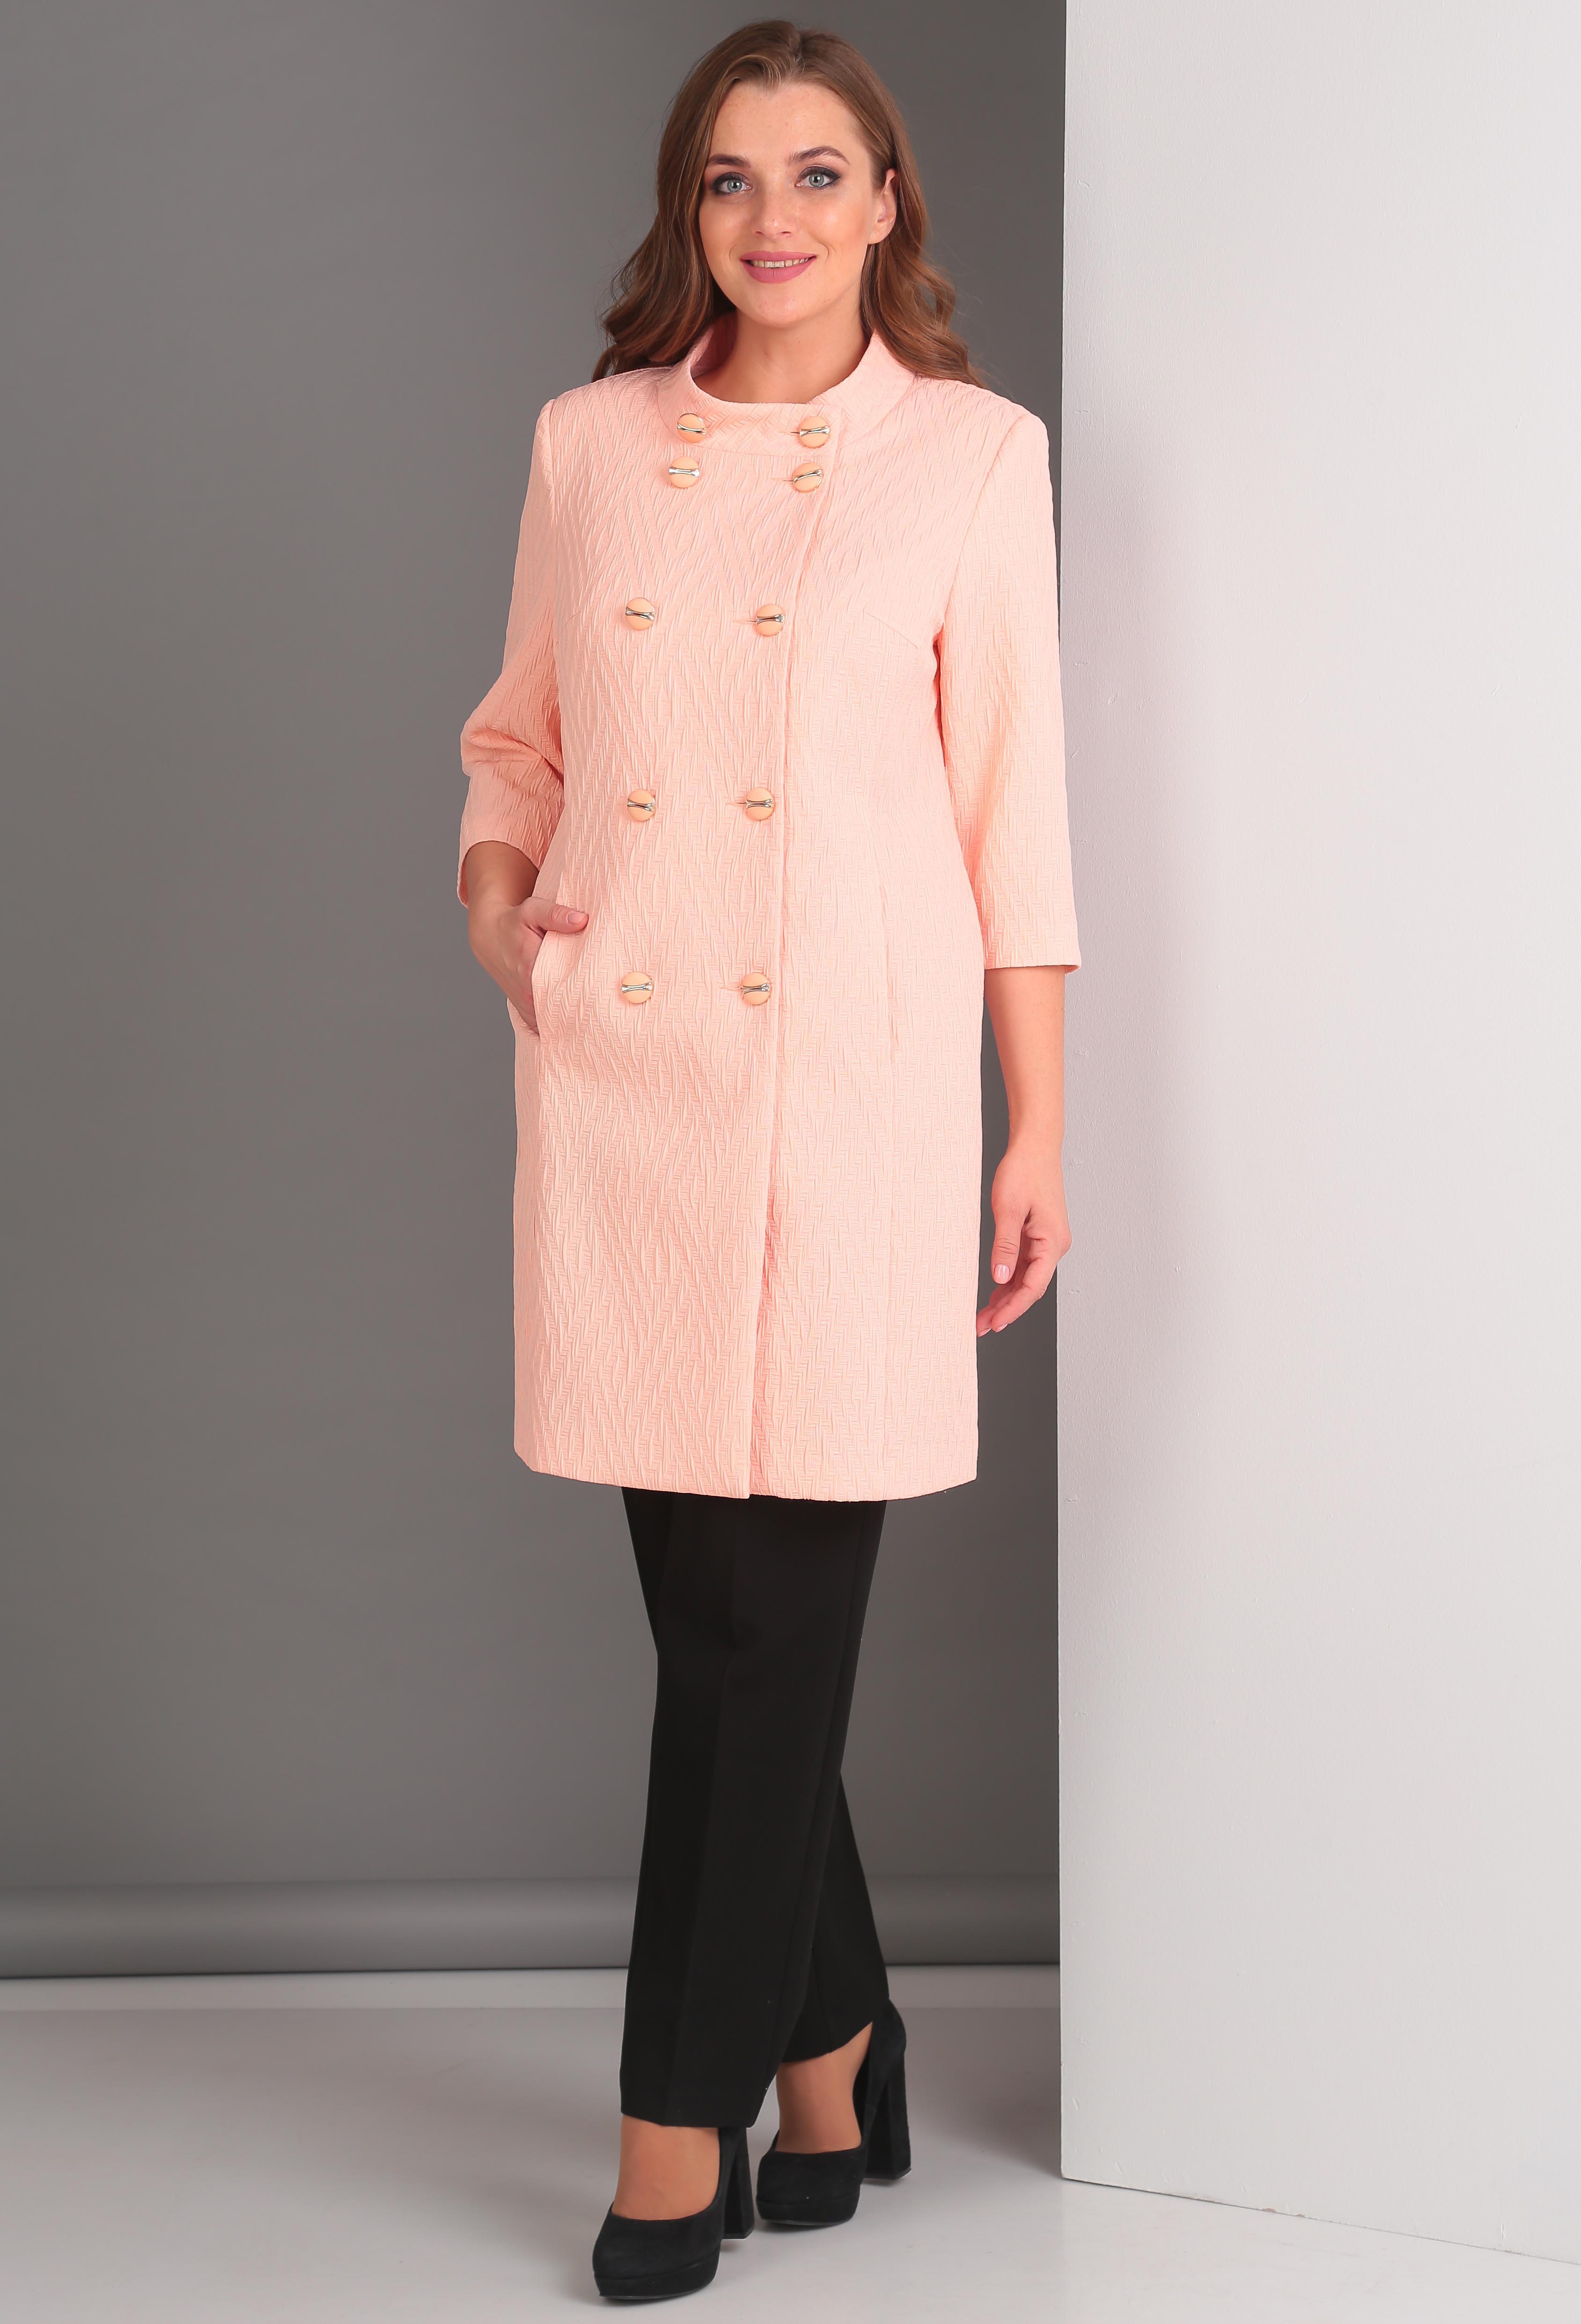 Пальто Anastasia Mak 521 пудра